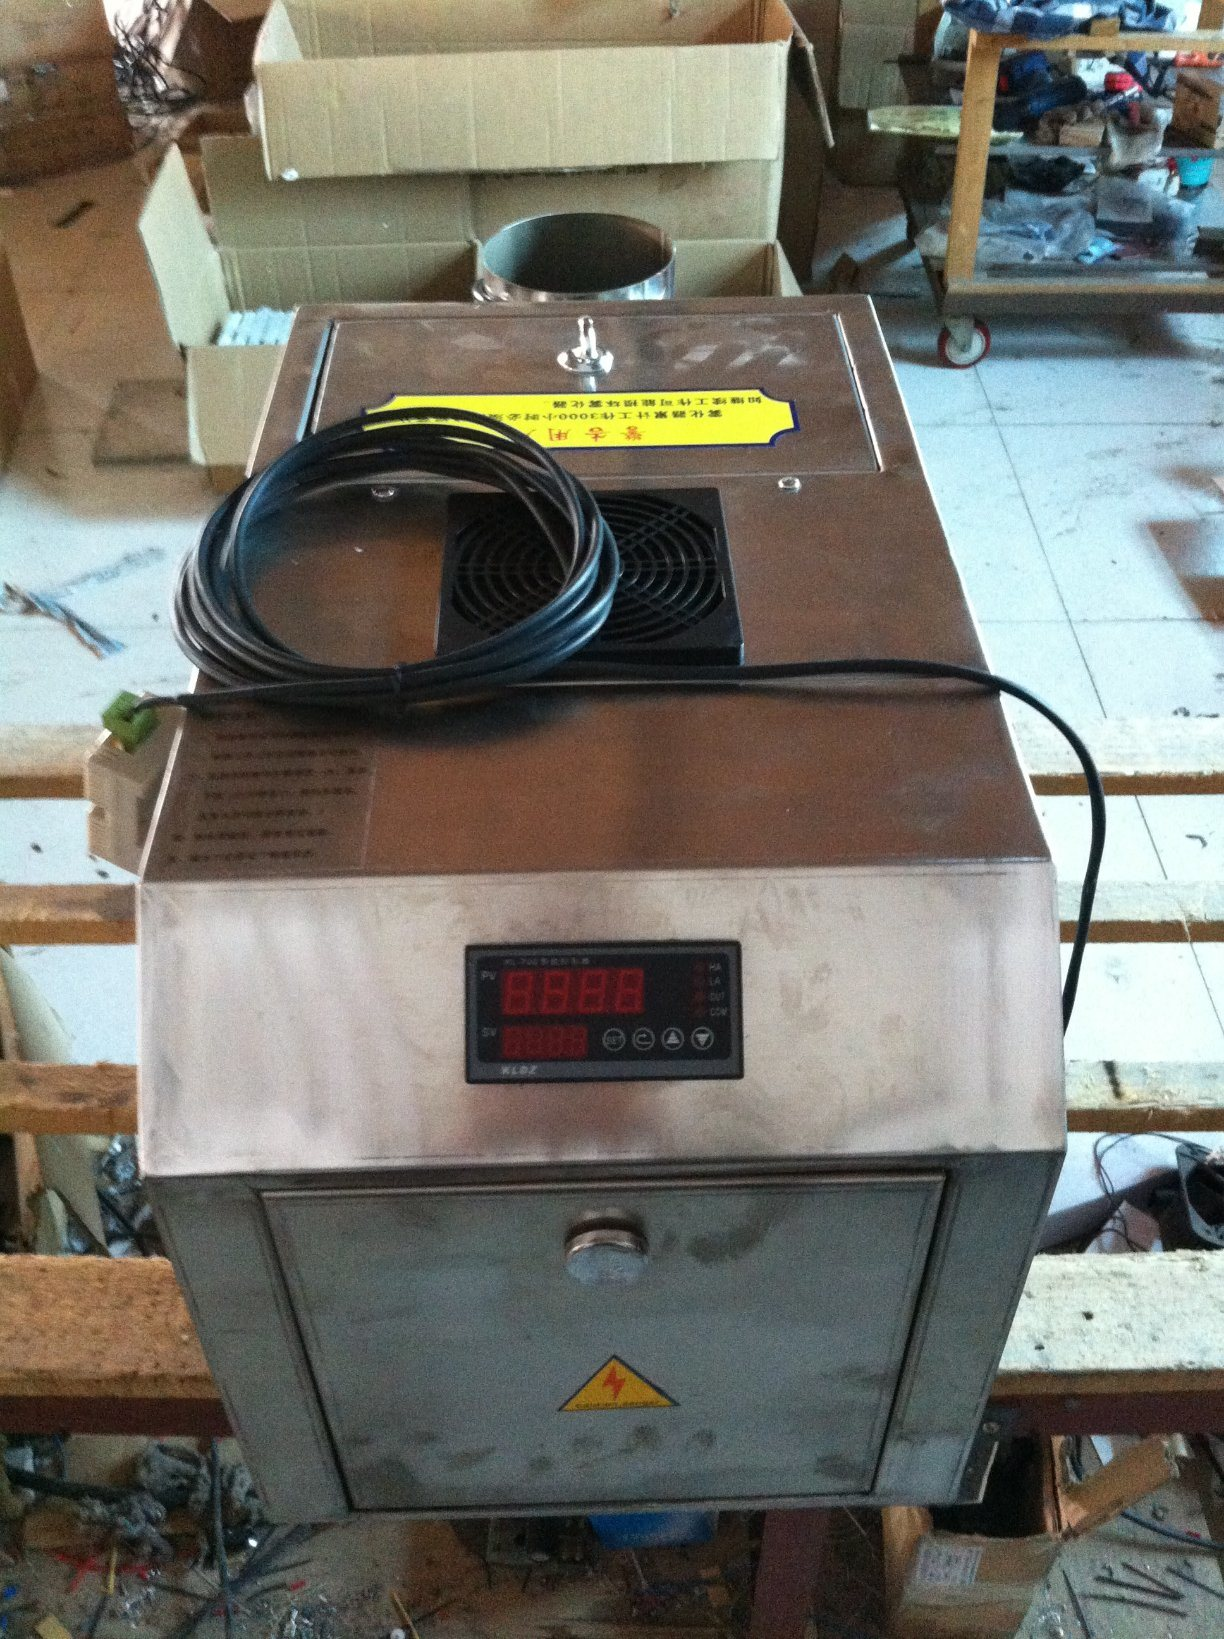 Dq-039 Humidifier for Mushroom Plant